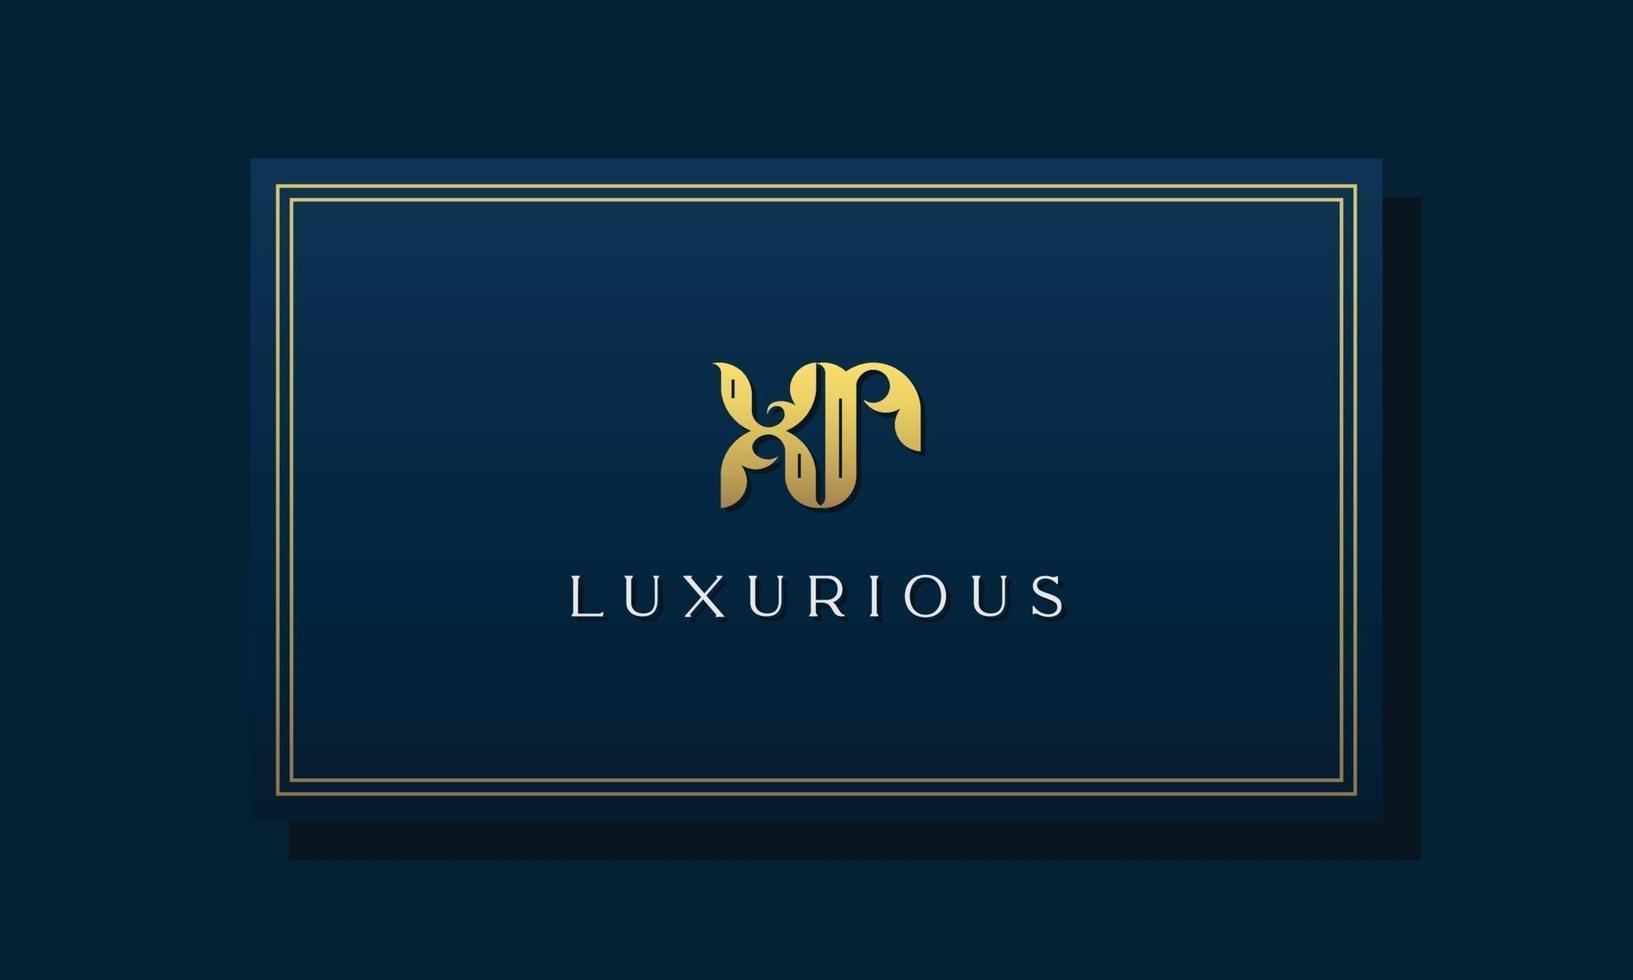 logotipo vintage real letras iniciais xr. vetor